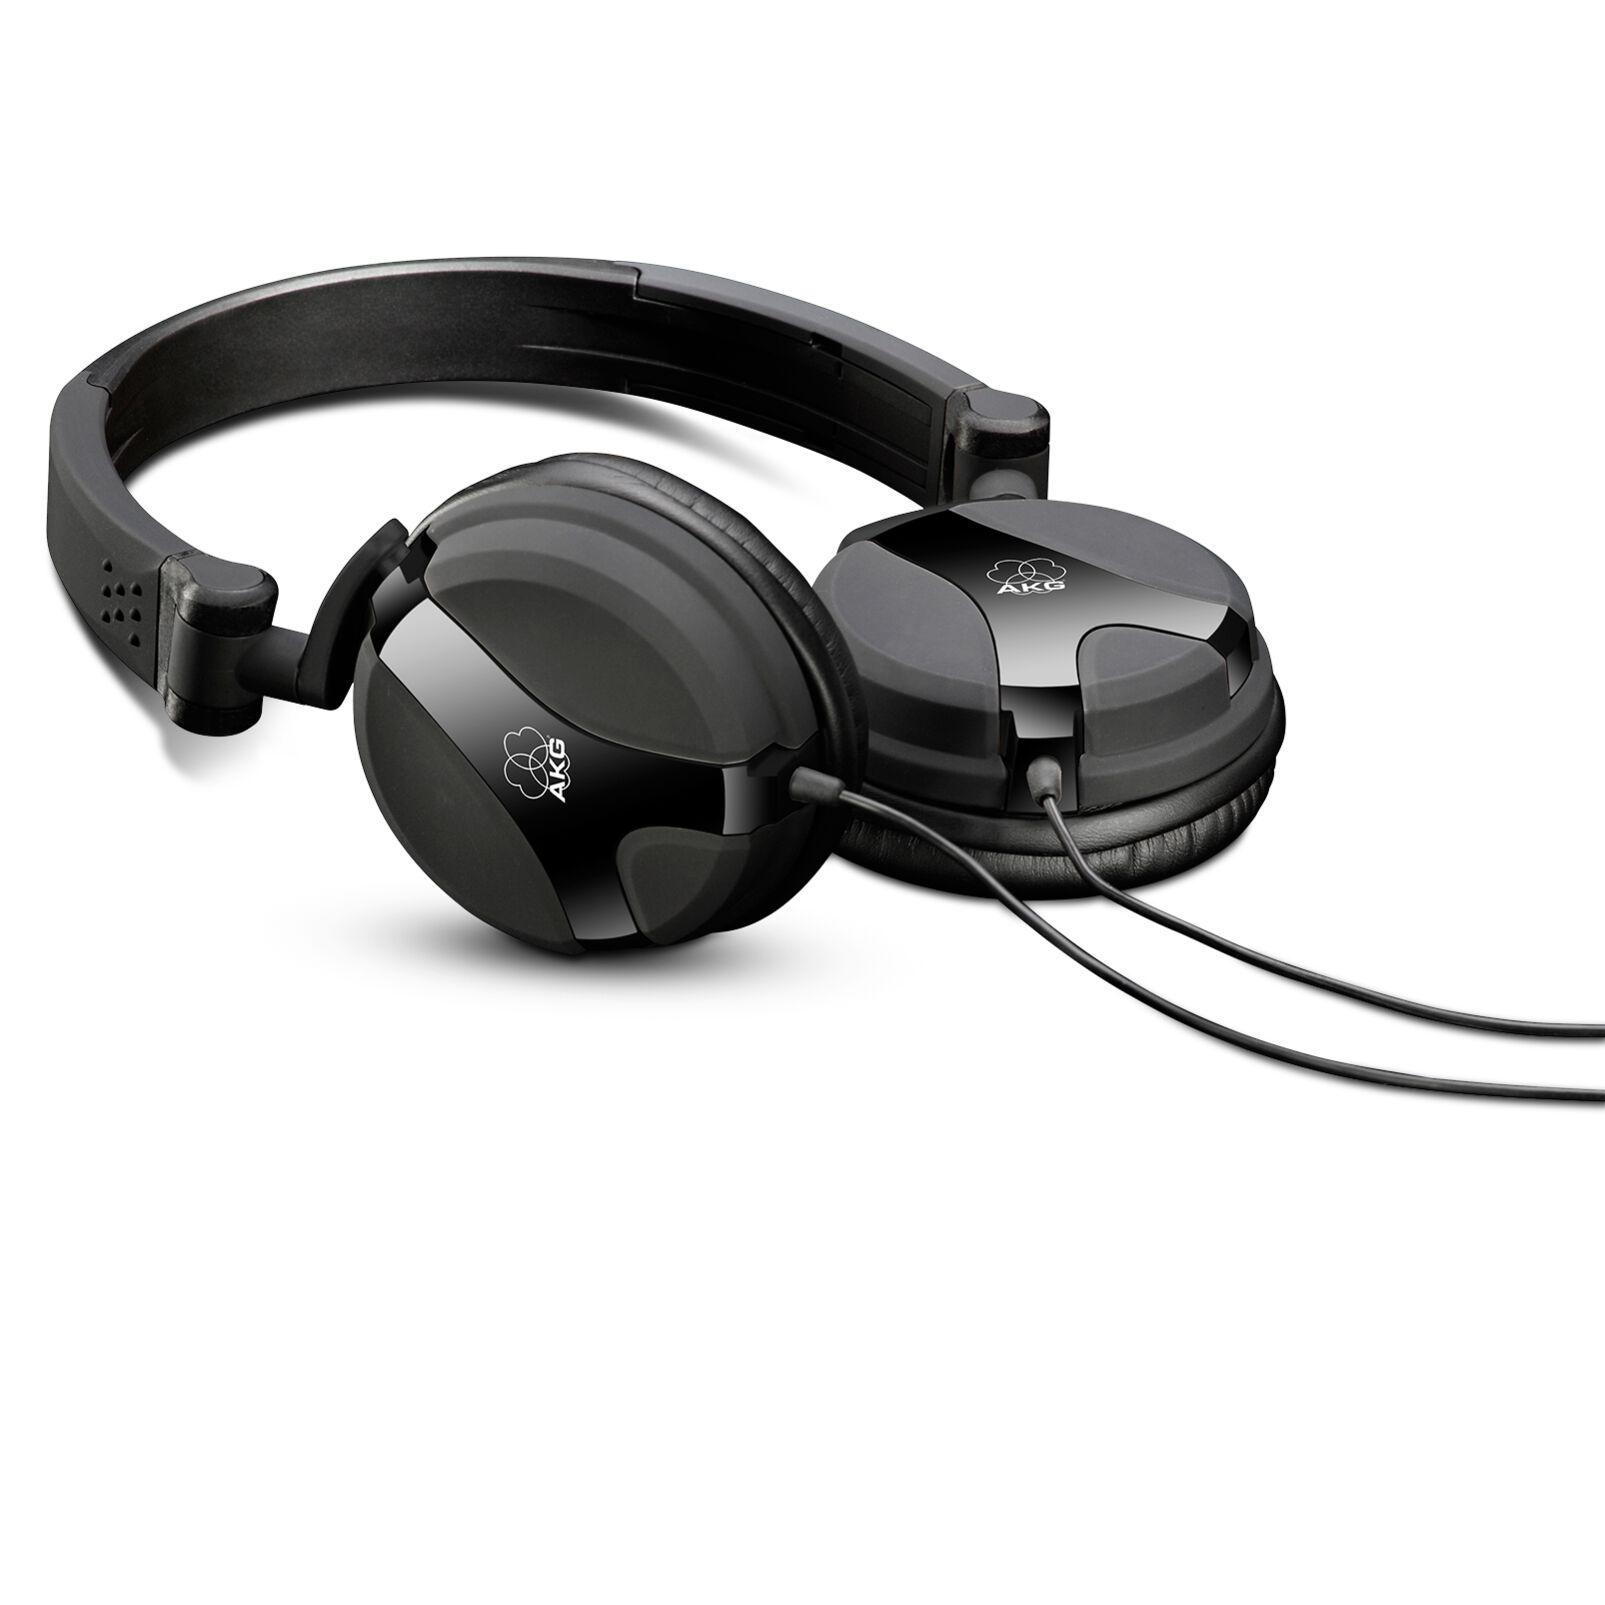 Image of AKG Harman K 518 DJ BLK DJ Koptelefoon On Ear Vouwbaar, Zwenkbare oorschelpen Zwart